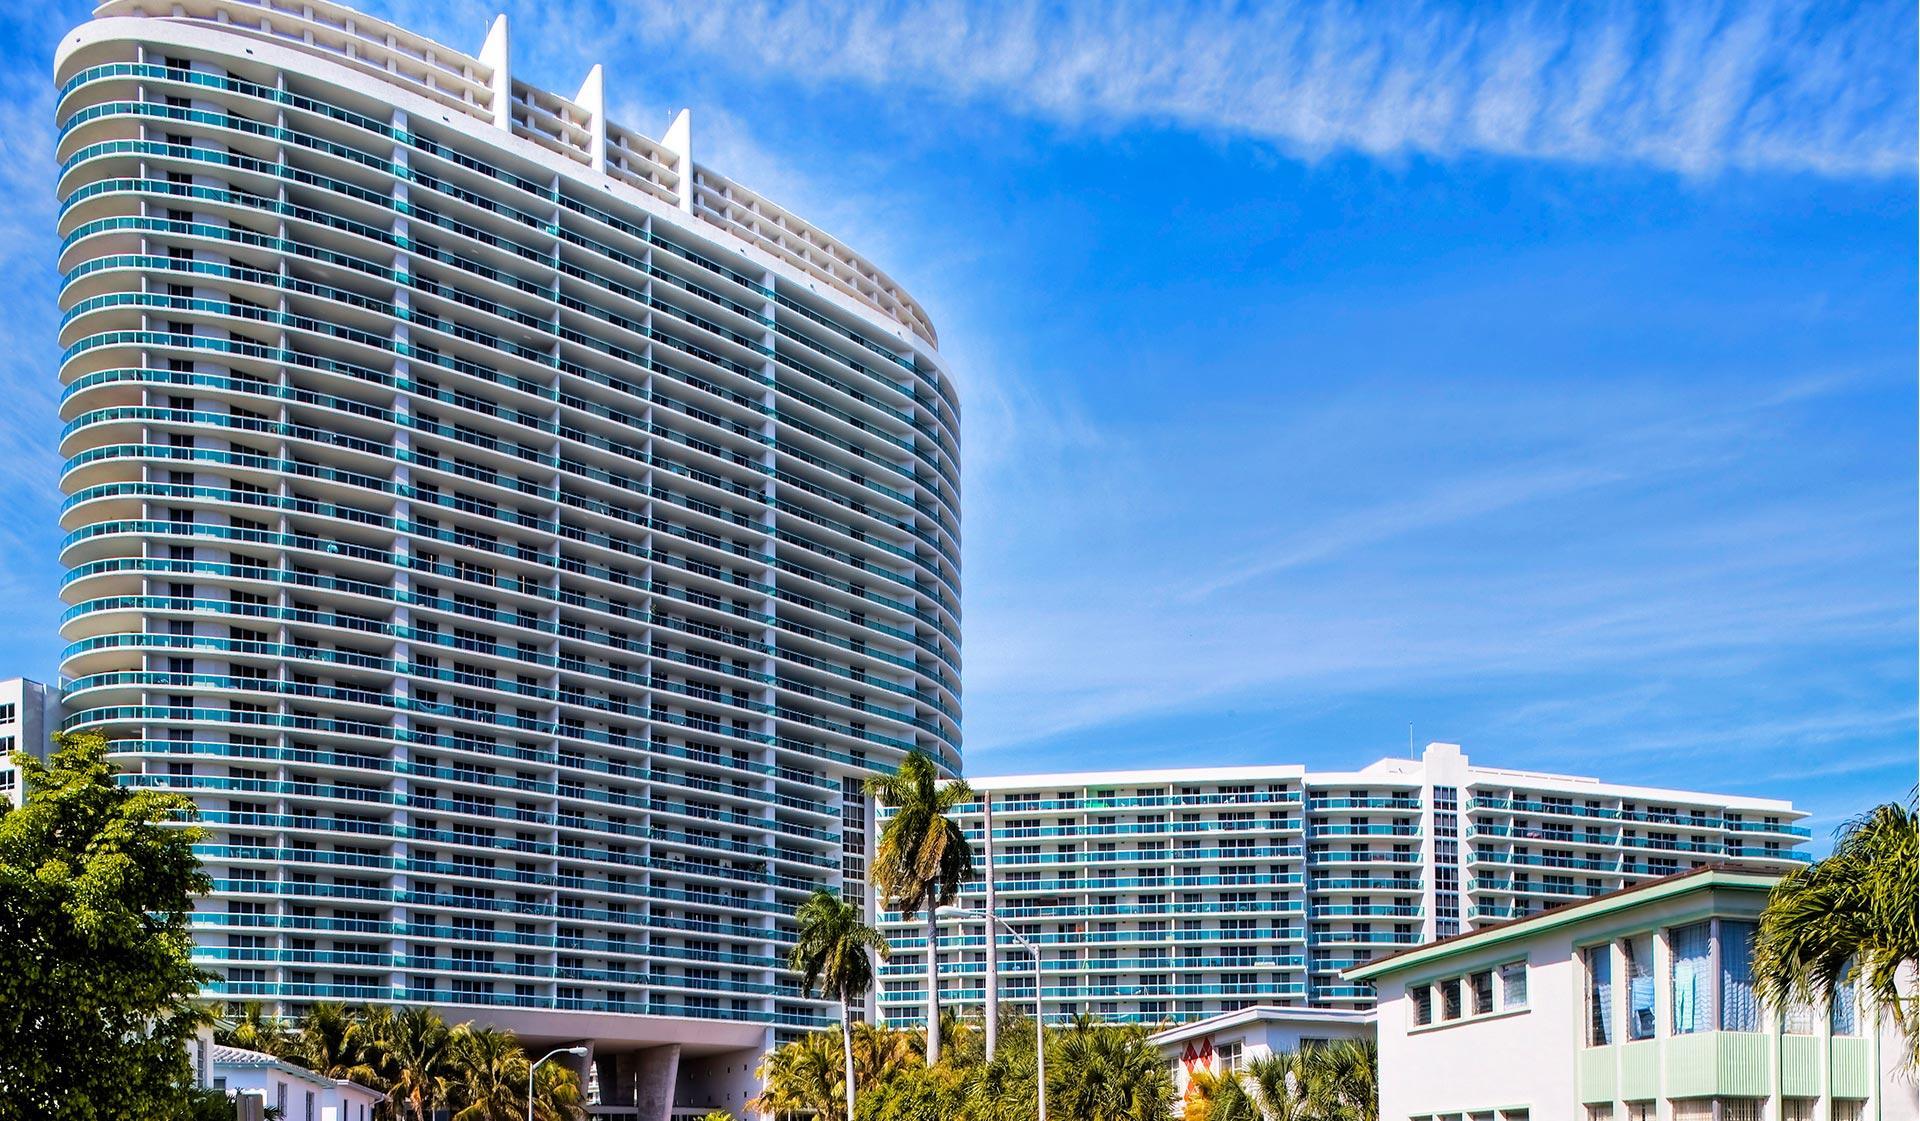 Flamingo South Beach North Tower Miami